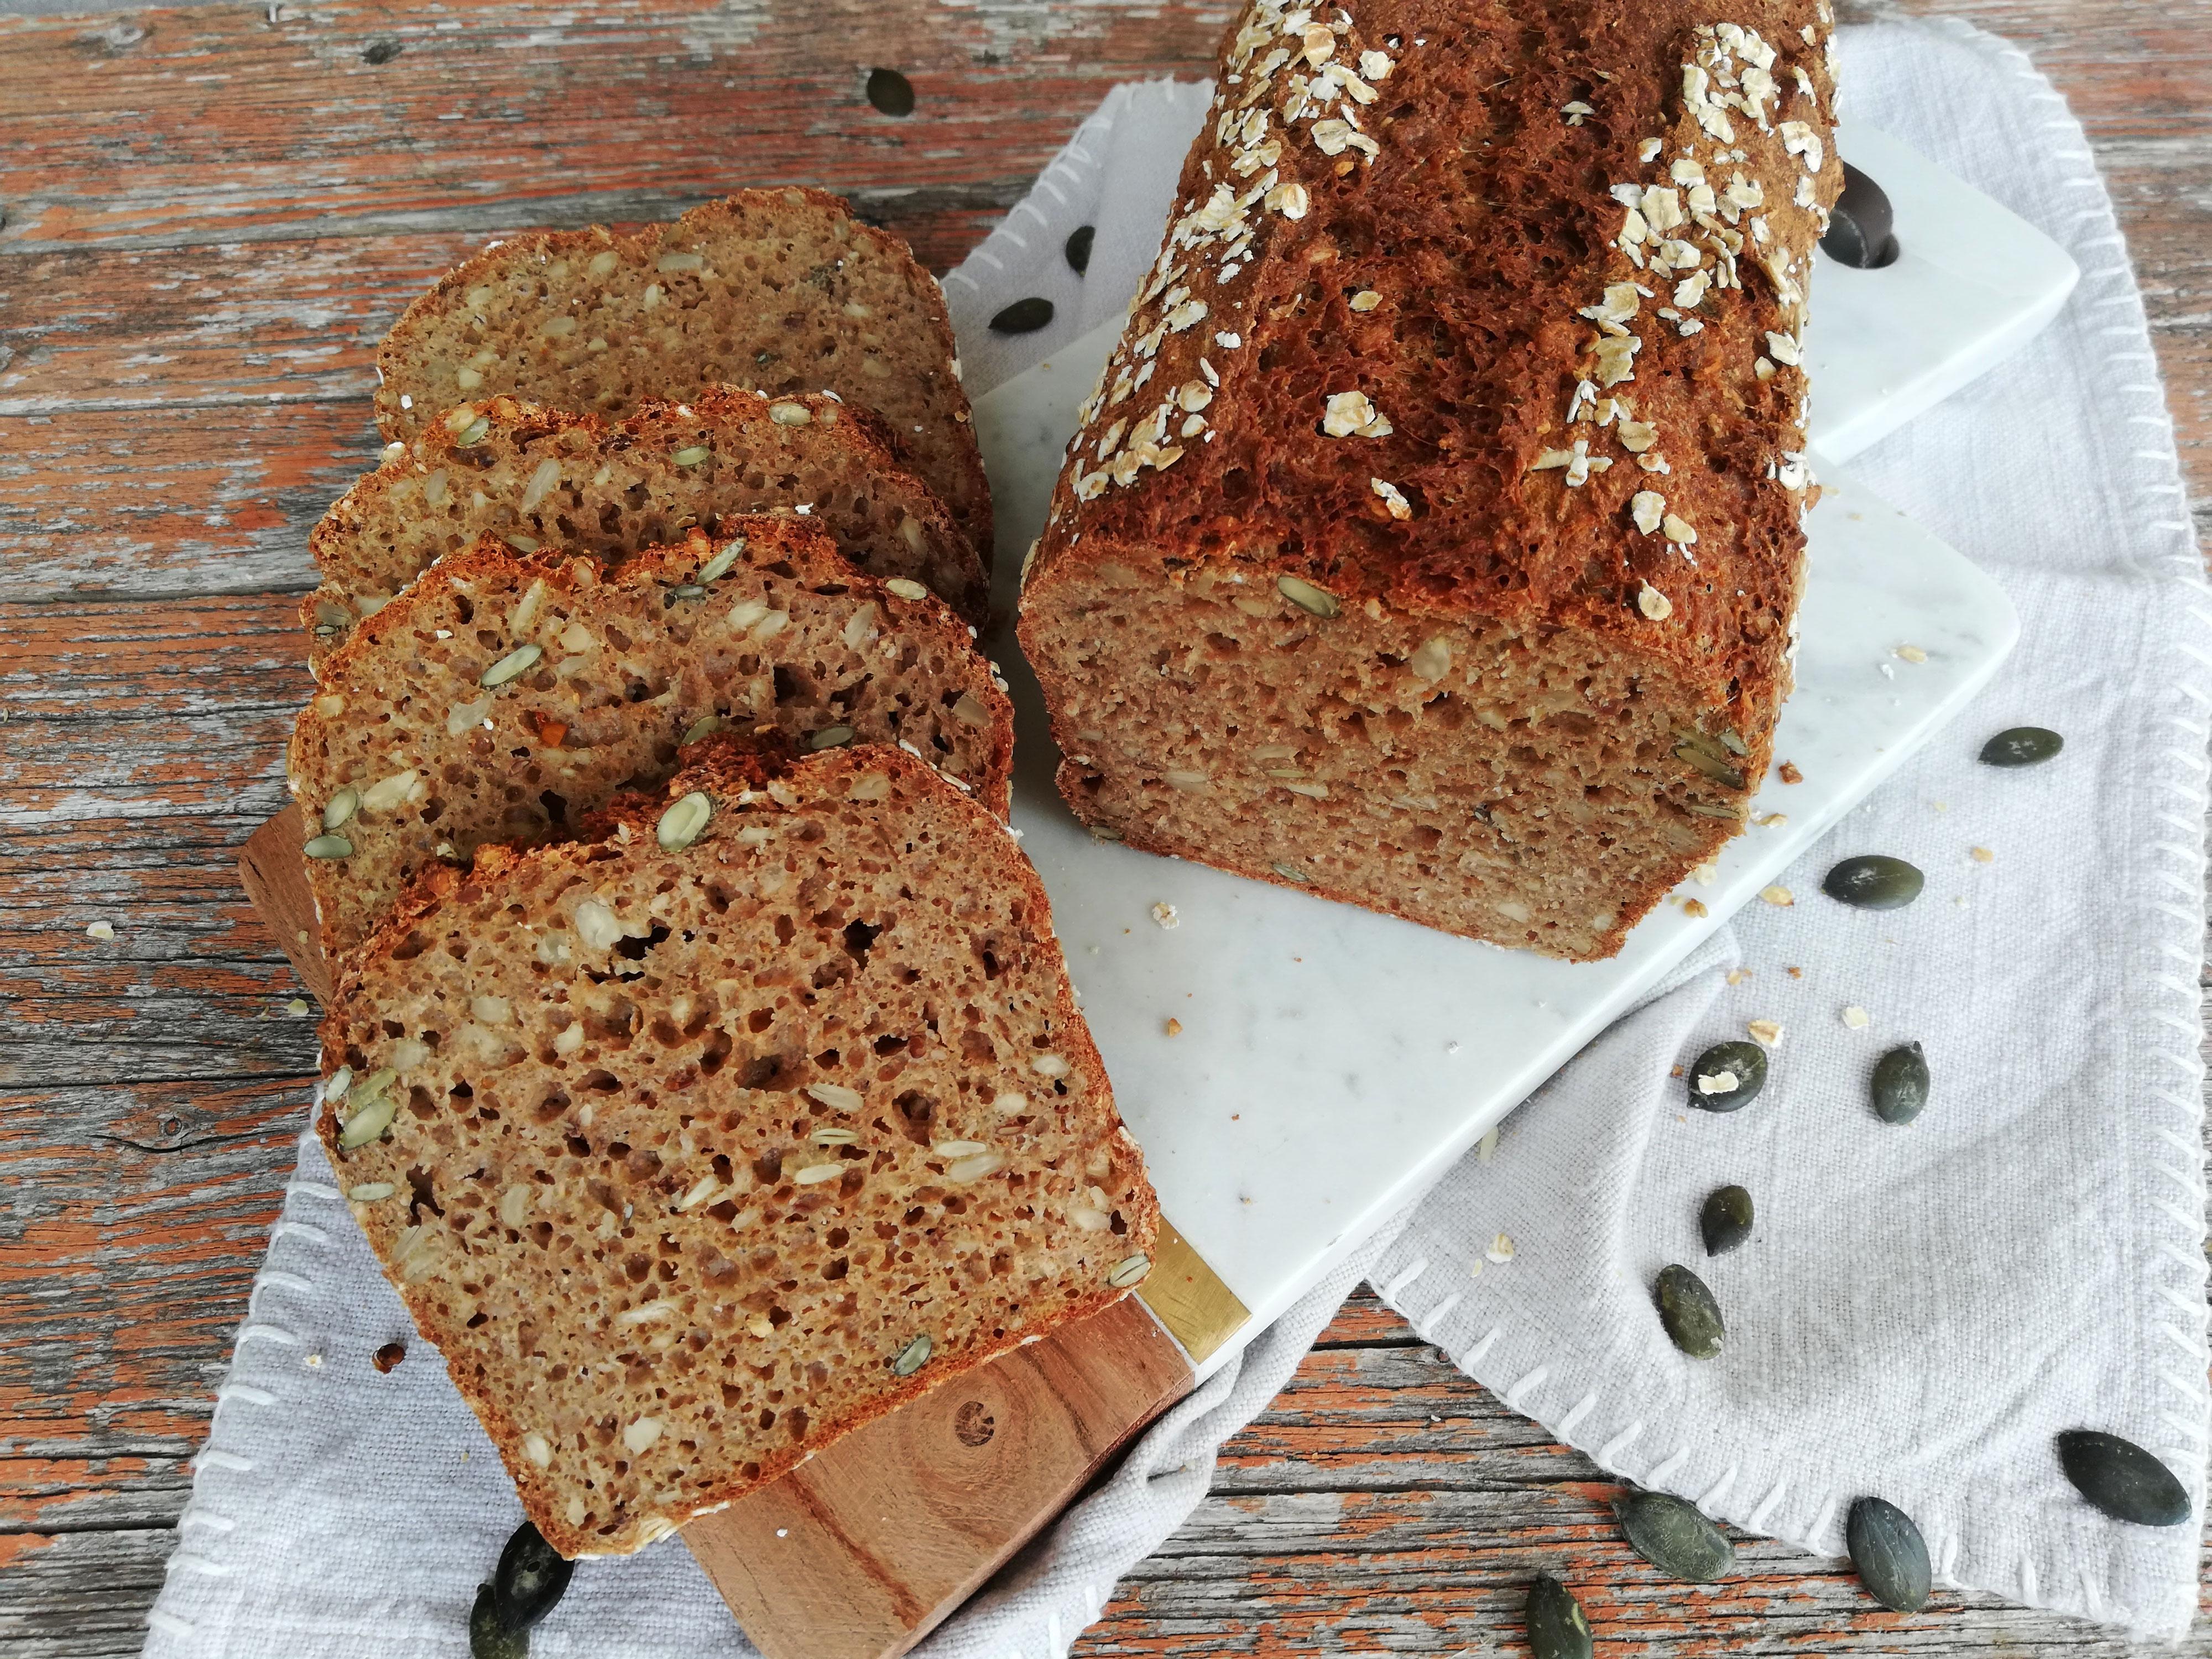 Dinkel Korn Brot   LelaLecker die Küchenfee aus Hohenlohe